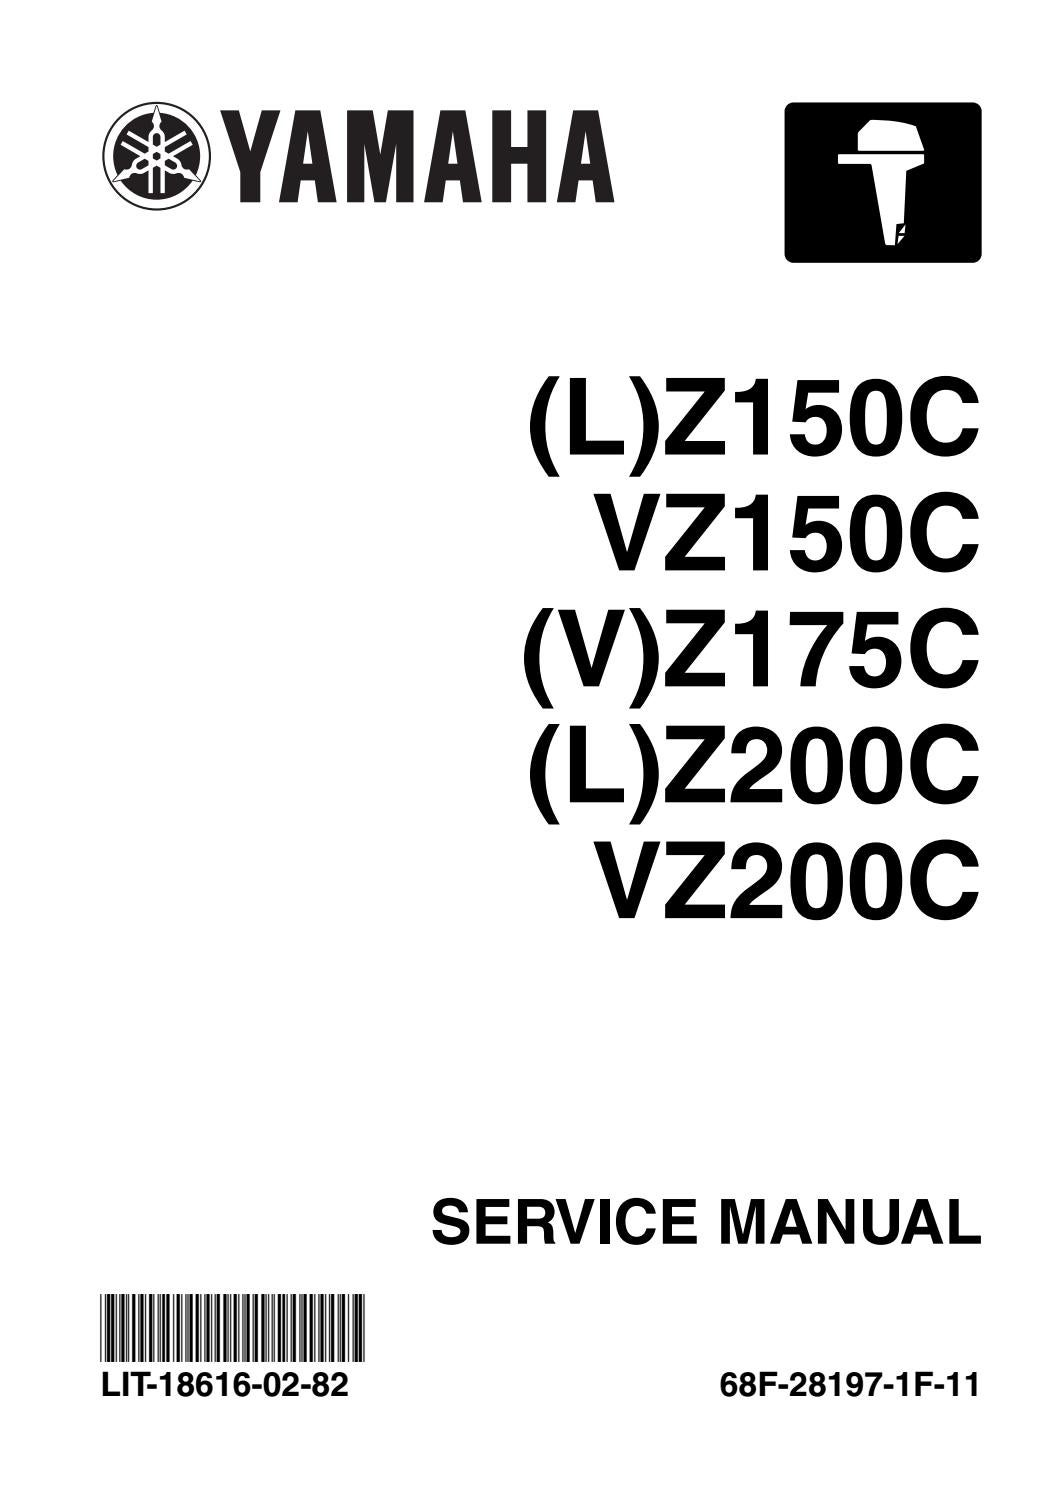 Yamaha Vmax Vz150 Vz175 Z150 Z175 Z200 Lz150 Lz200 V6